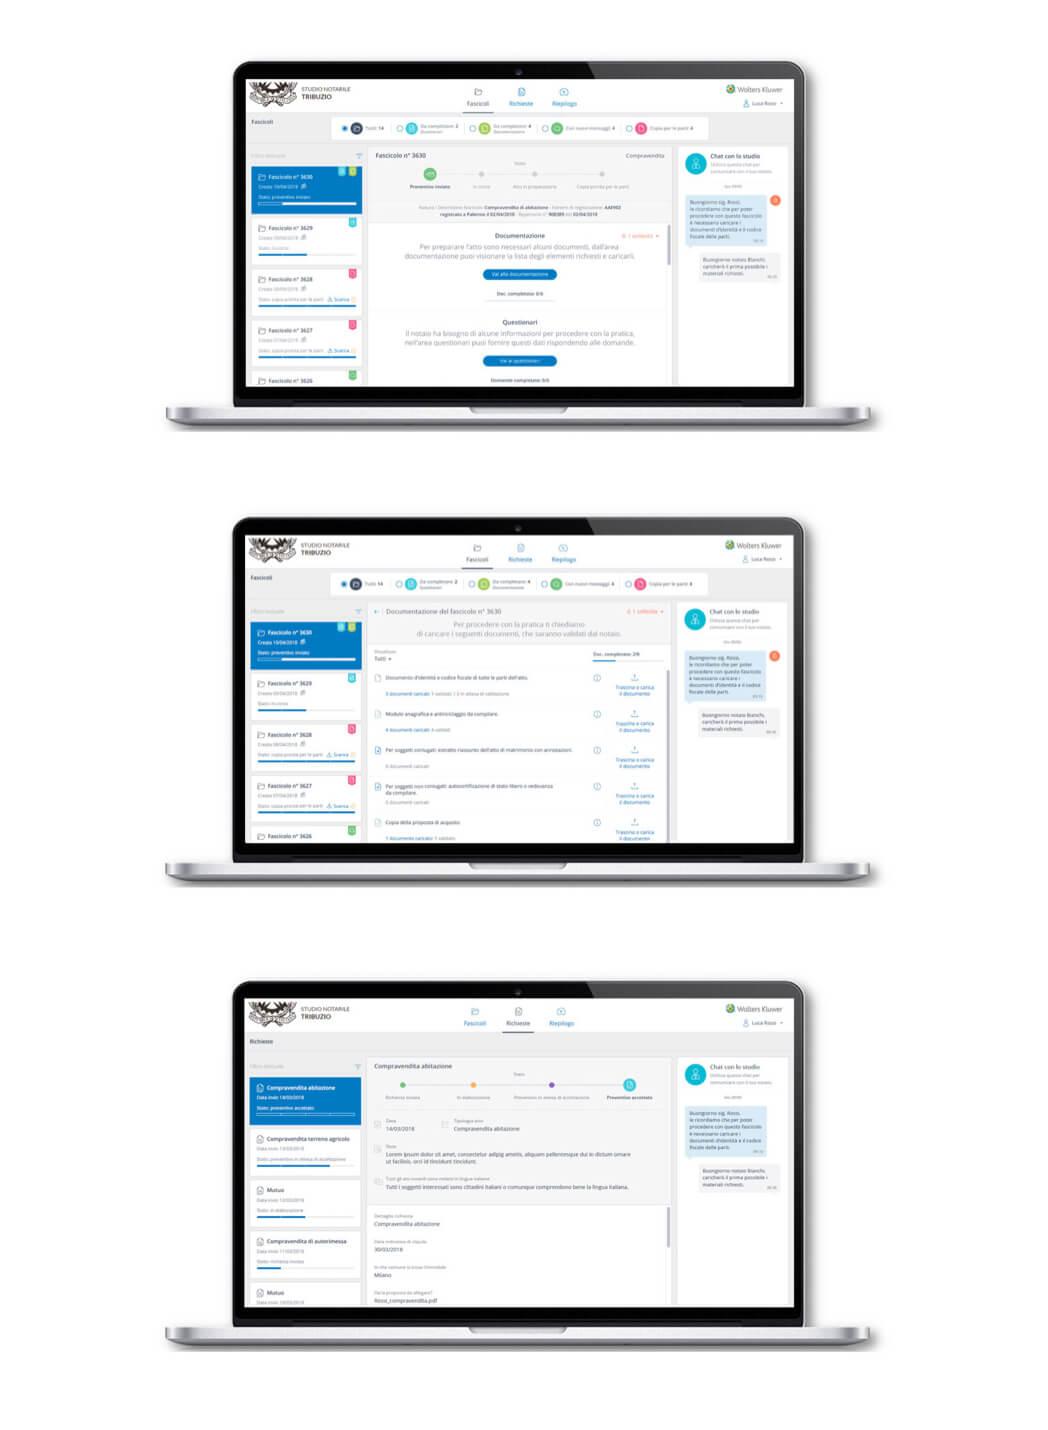 E-services - share